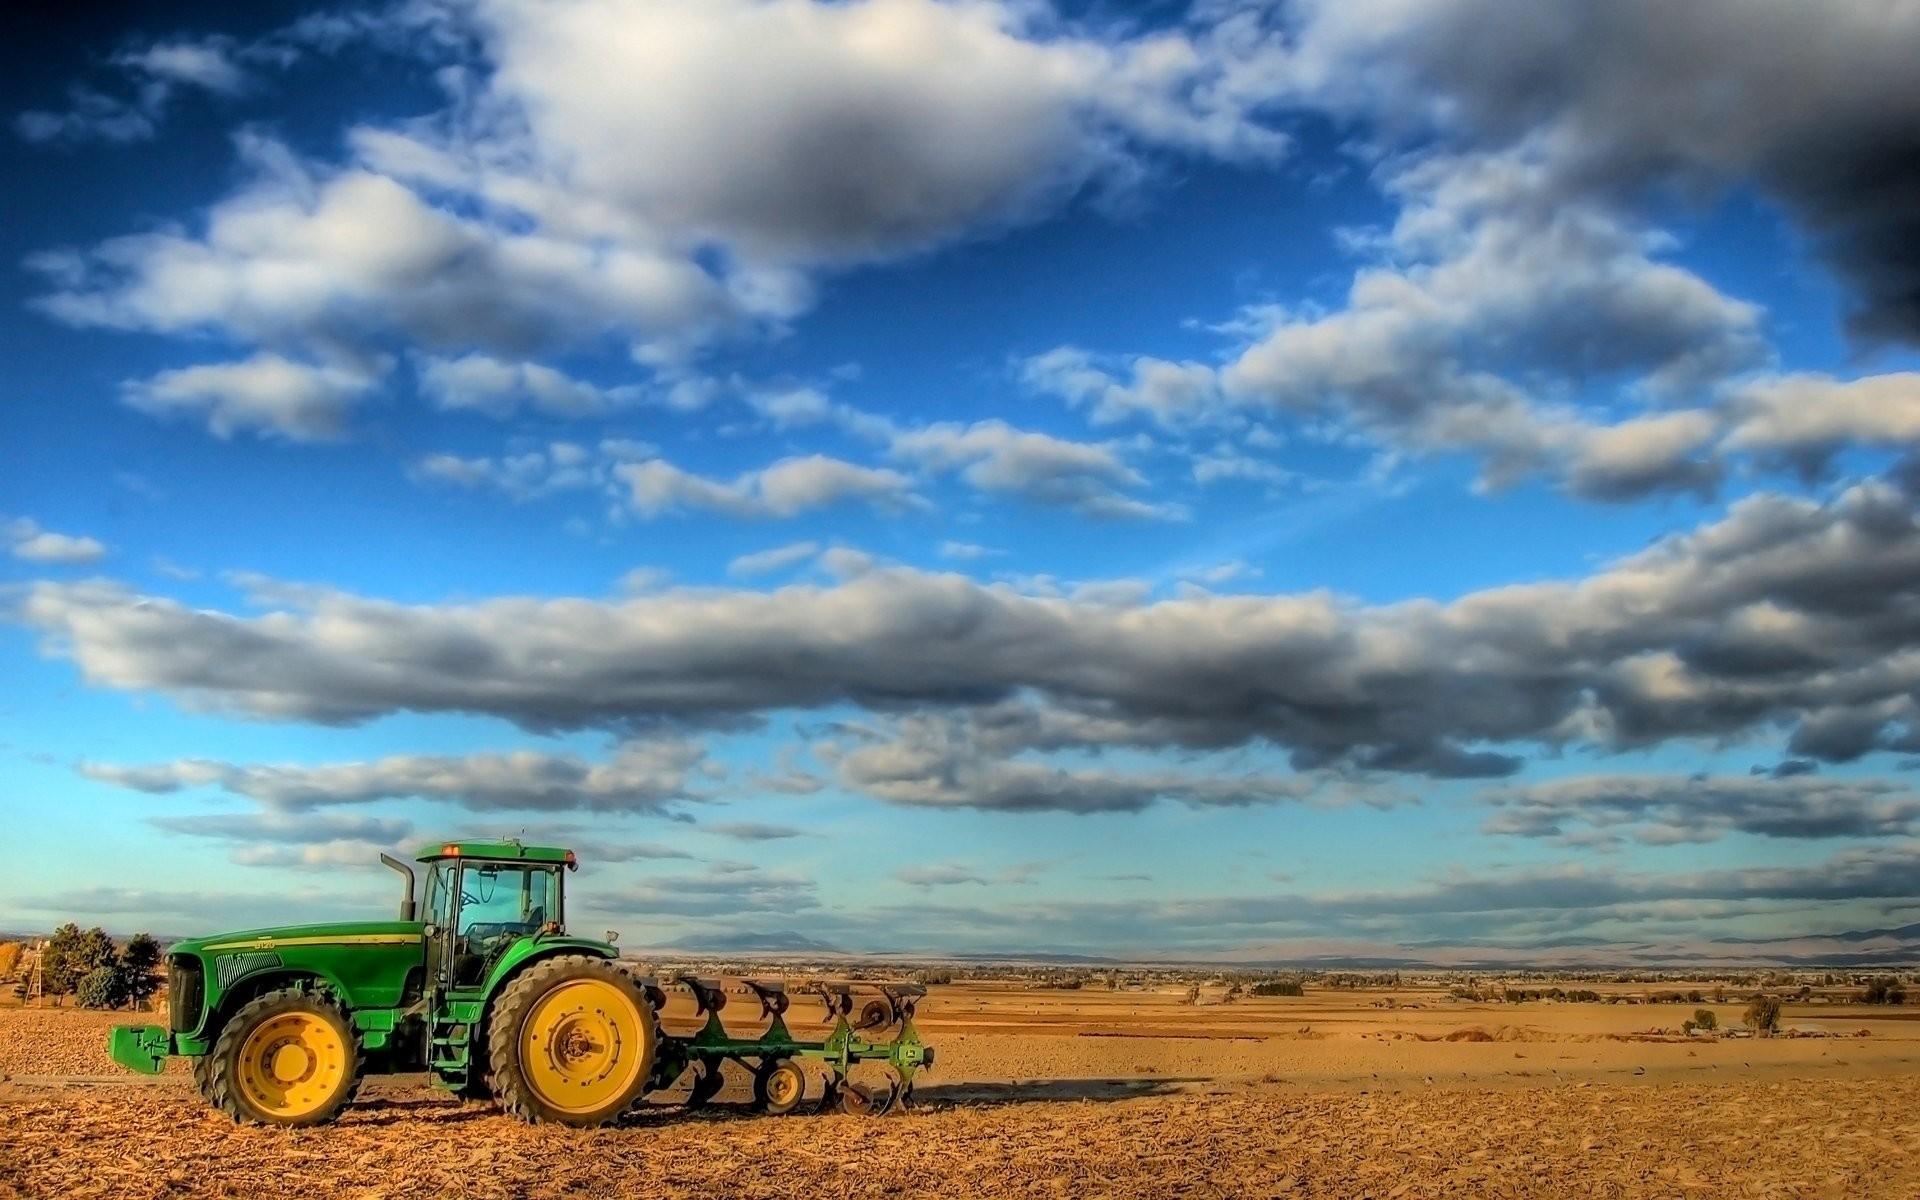 Res: 1920x1200, Vehicles - Tractor Landscape Farm Wallpaper